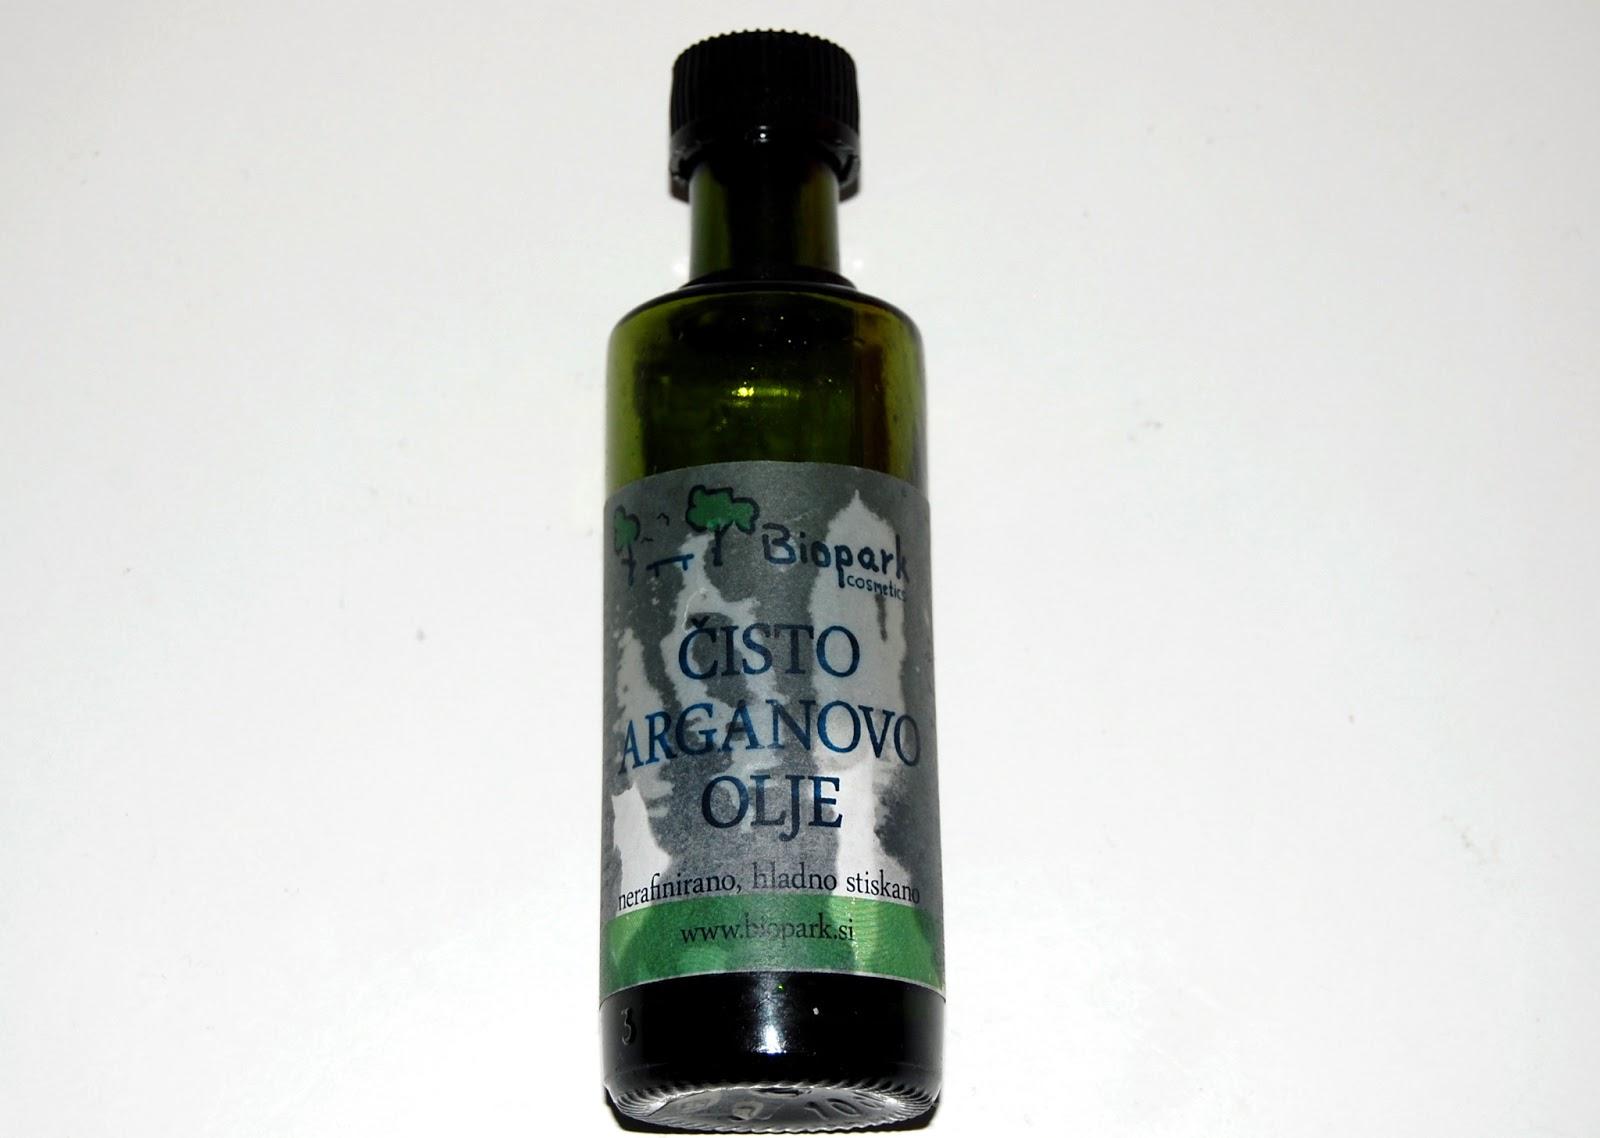 Biopark Cosmetics Čisto arganovo olje